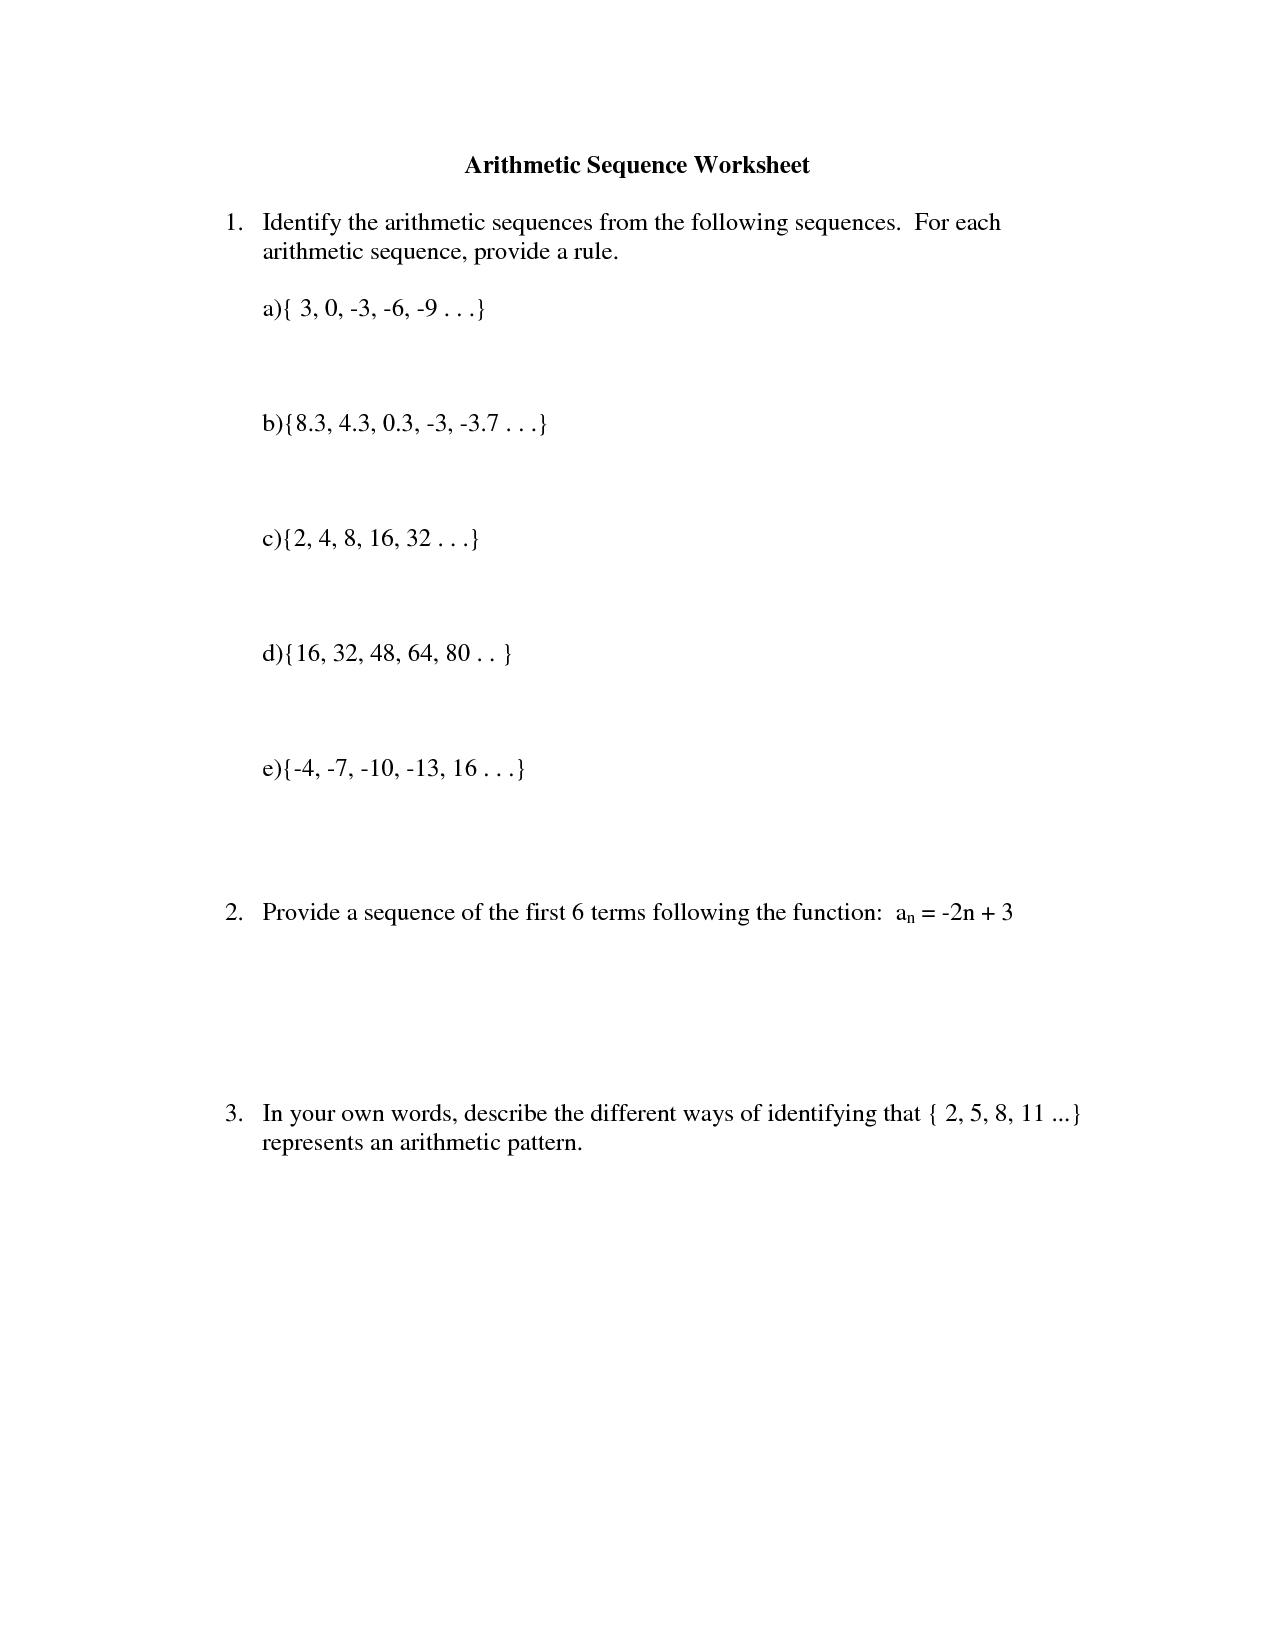 10 Best Images of Math Sequencing Worksheets  Number Patterns Worksheets 3rd Grade Math, Number